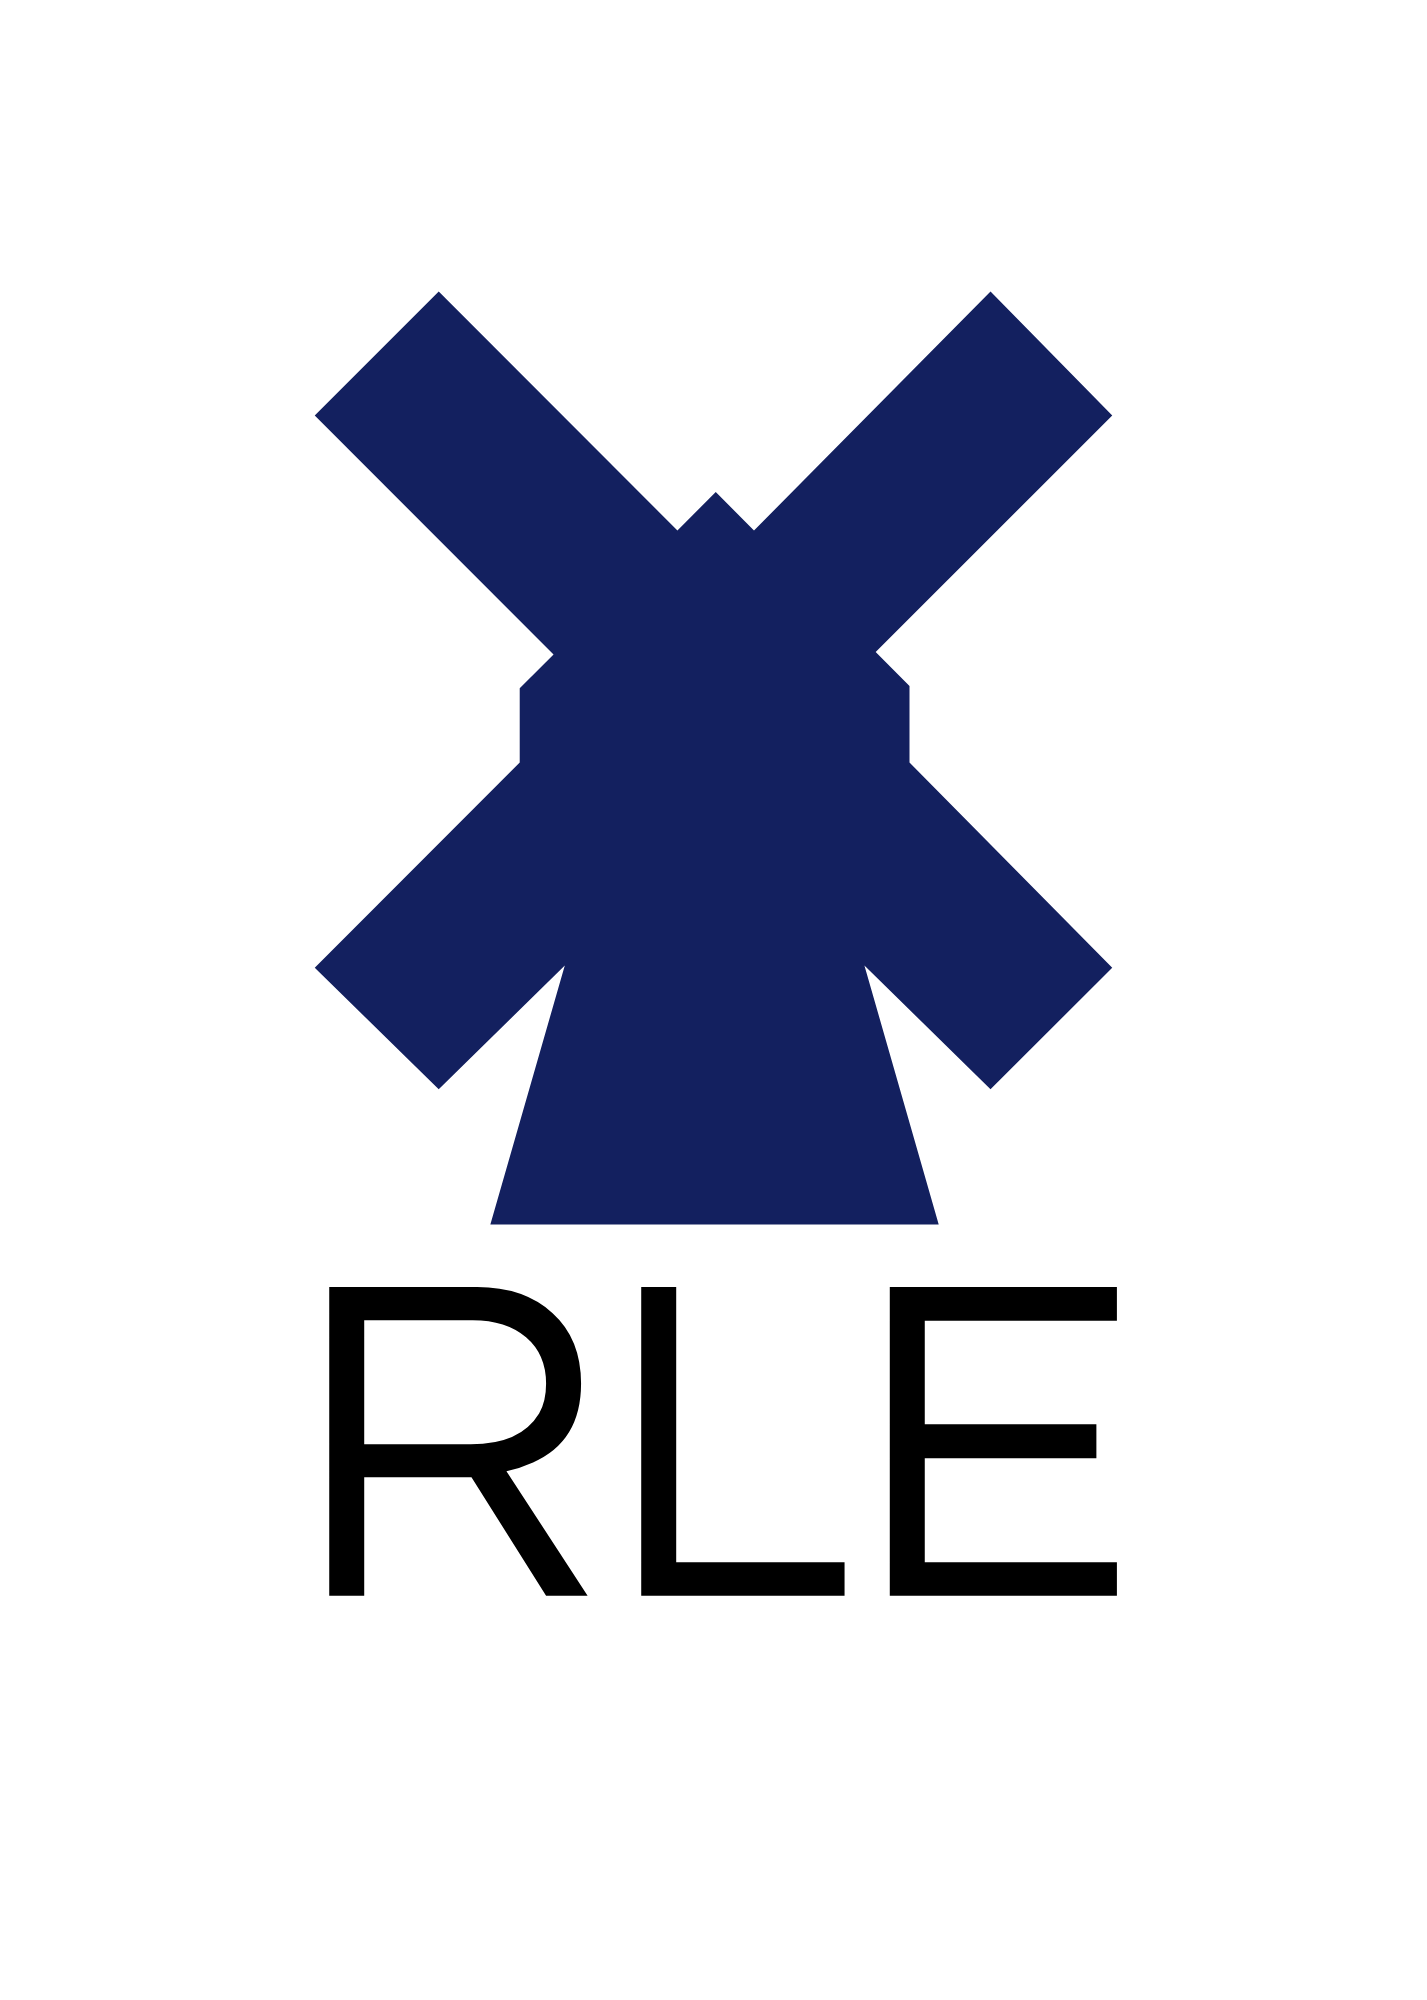 RLE-logo no words 2019.png